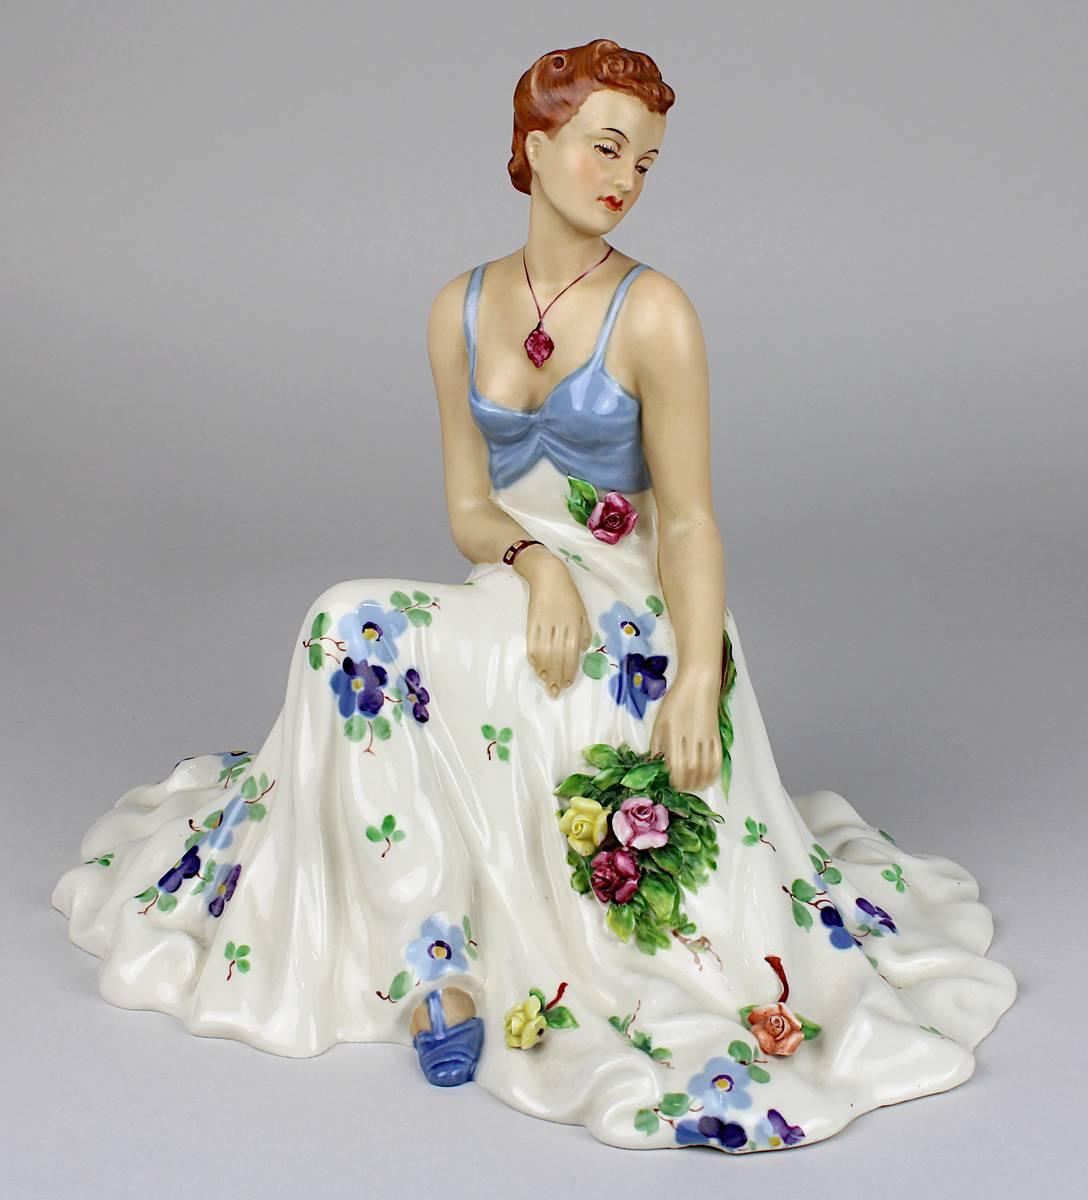 11-0001 - Royal Dux, Dame mit sommerlichem Kleid Image